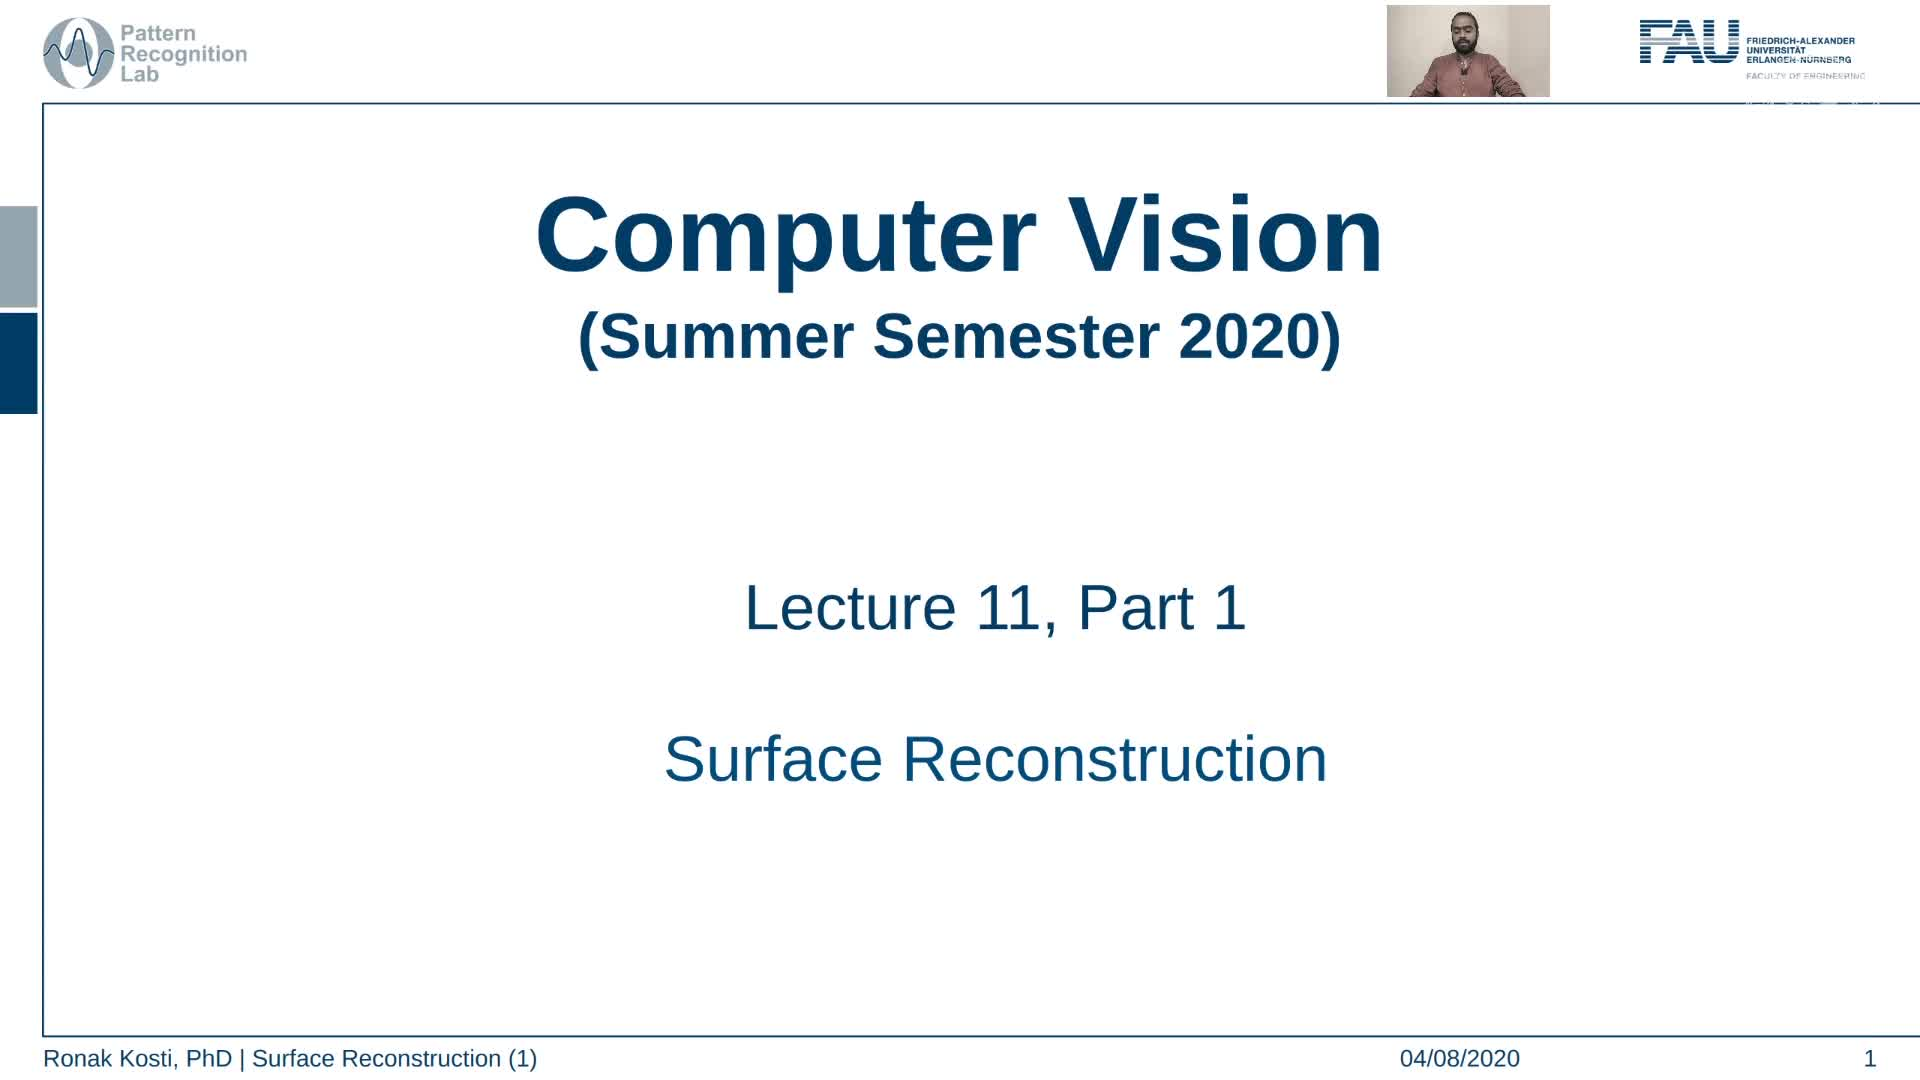 Surface Reconstruction (Lecture 11, Part 1) preview image